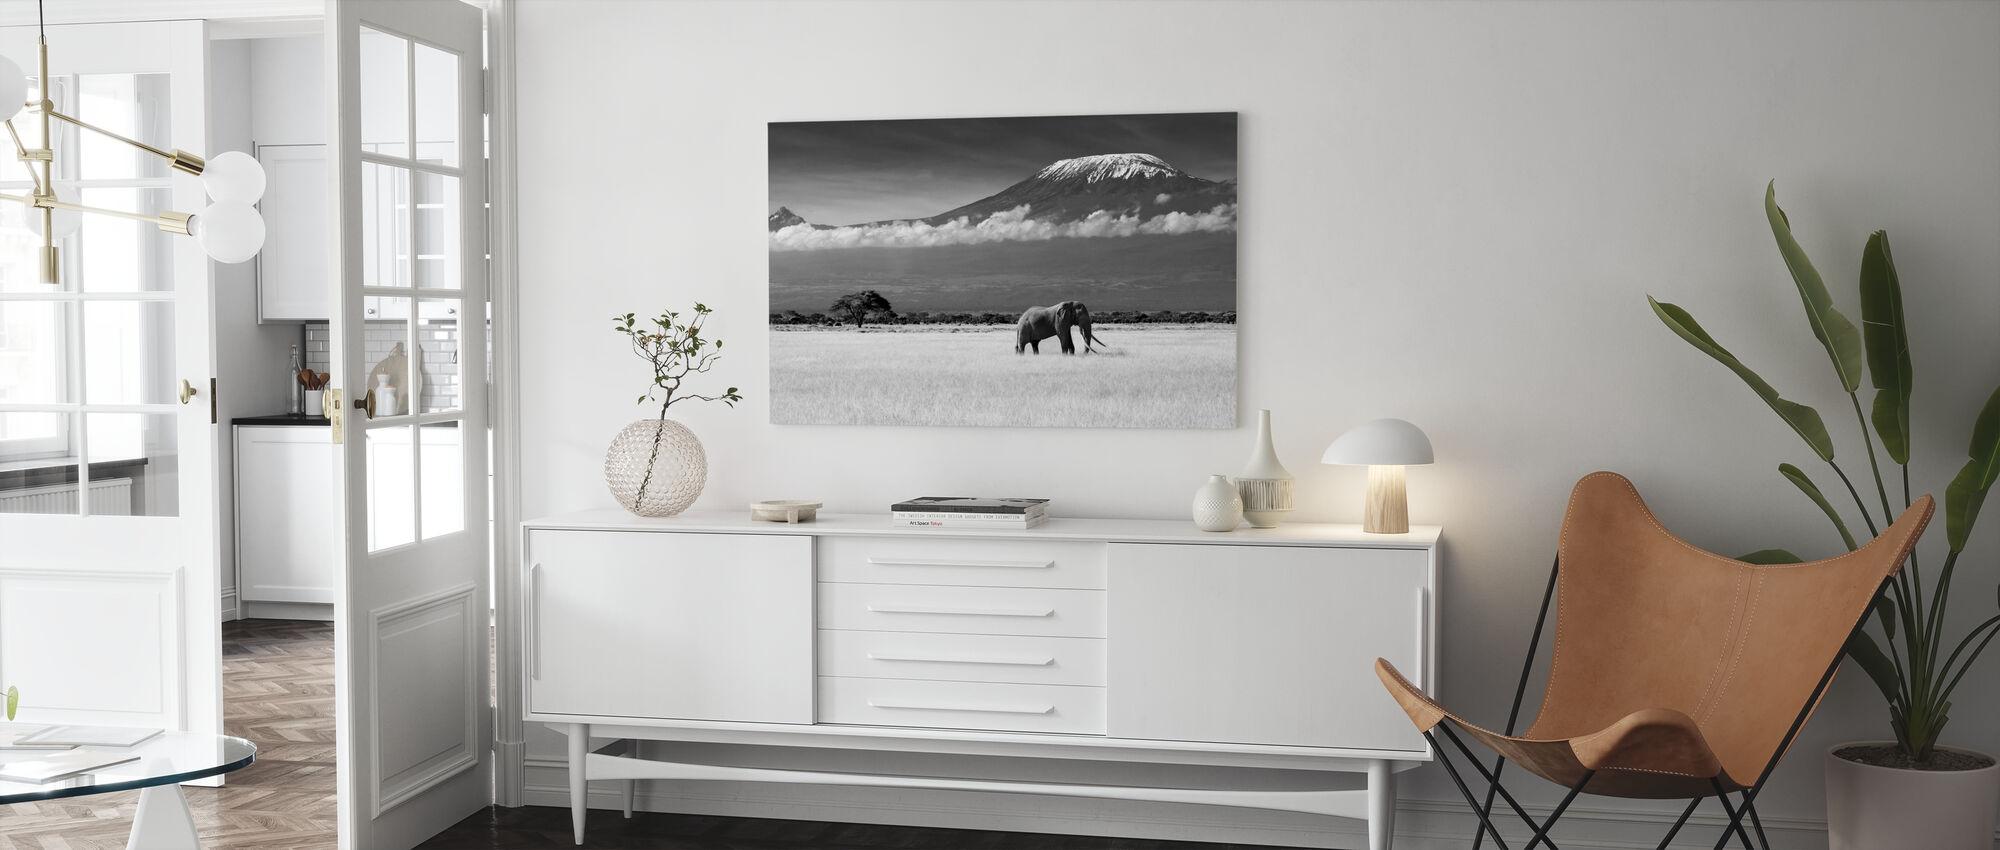 Elephant Landscape - Canvas print - Living Room